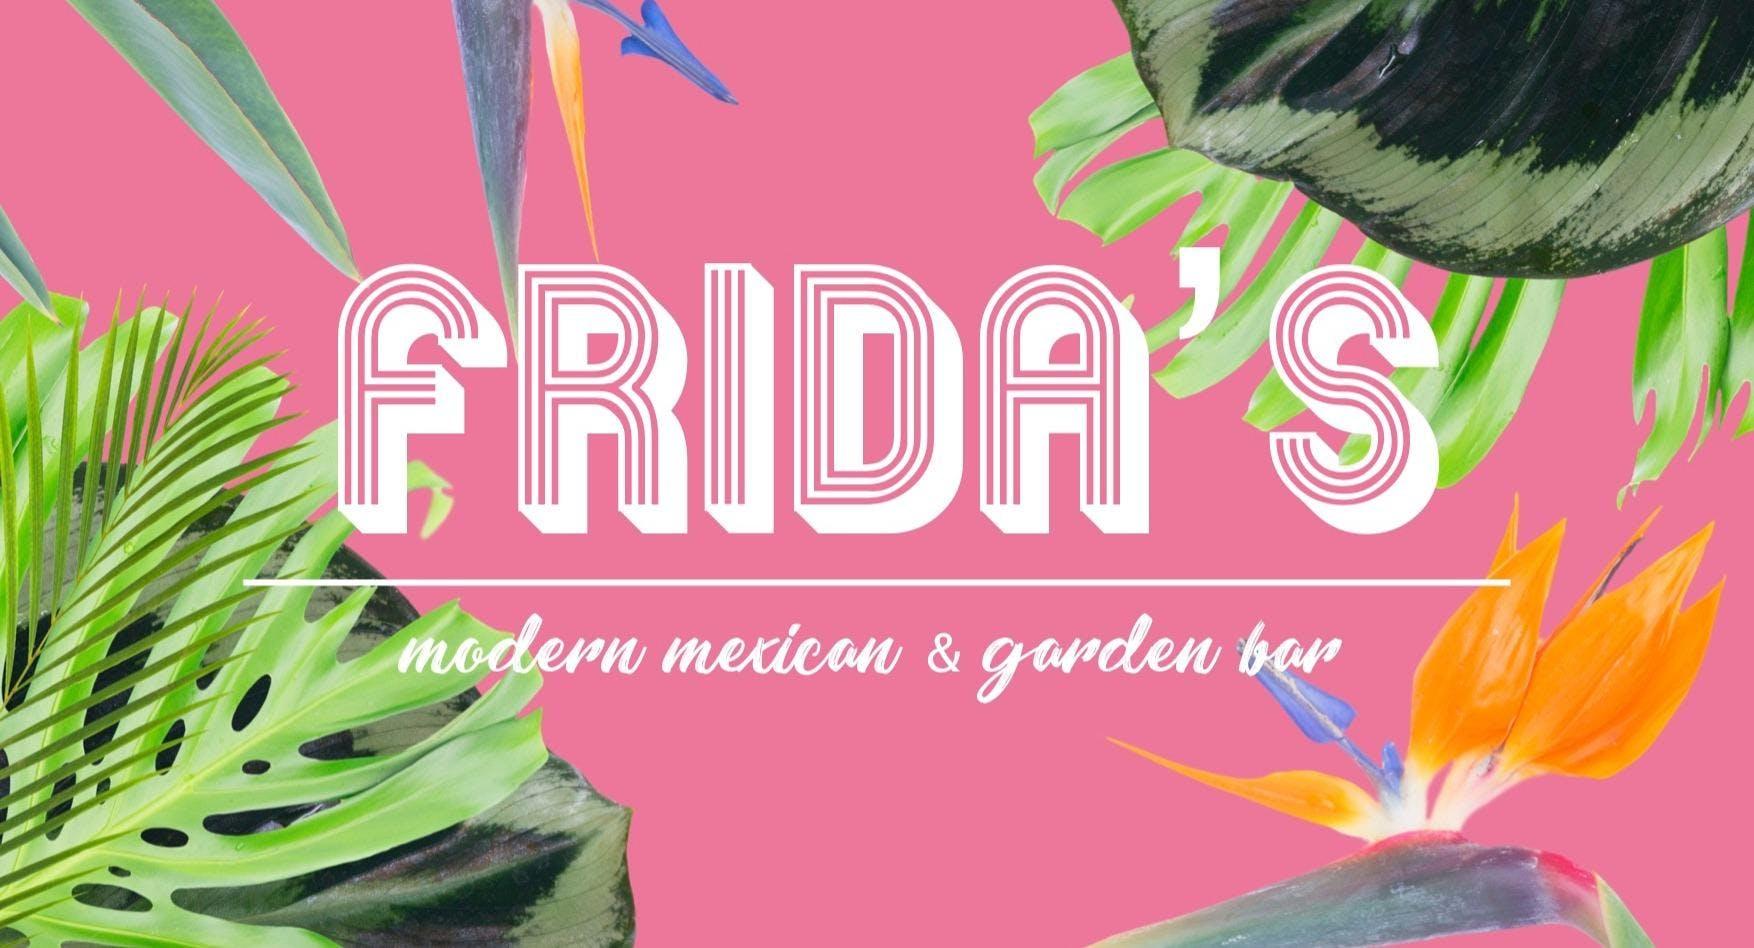 Frida's